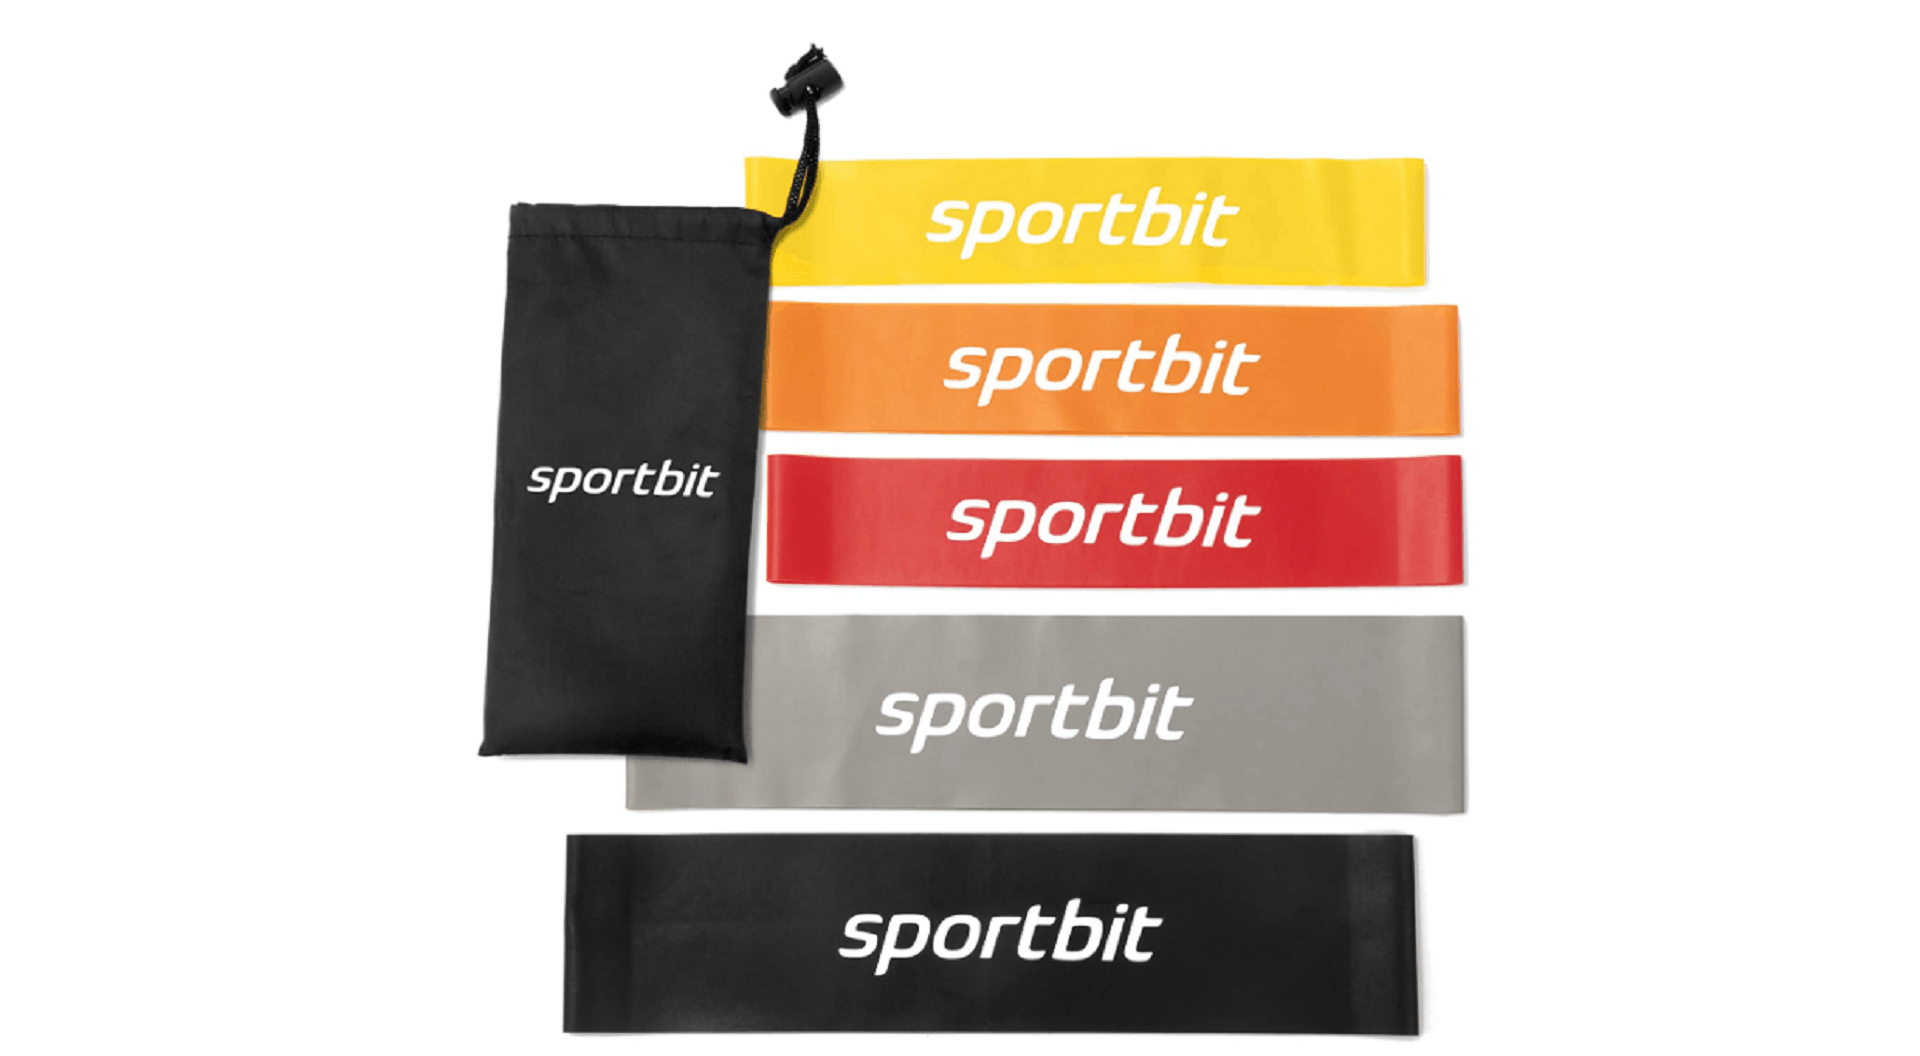 sportsbit